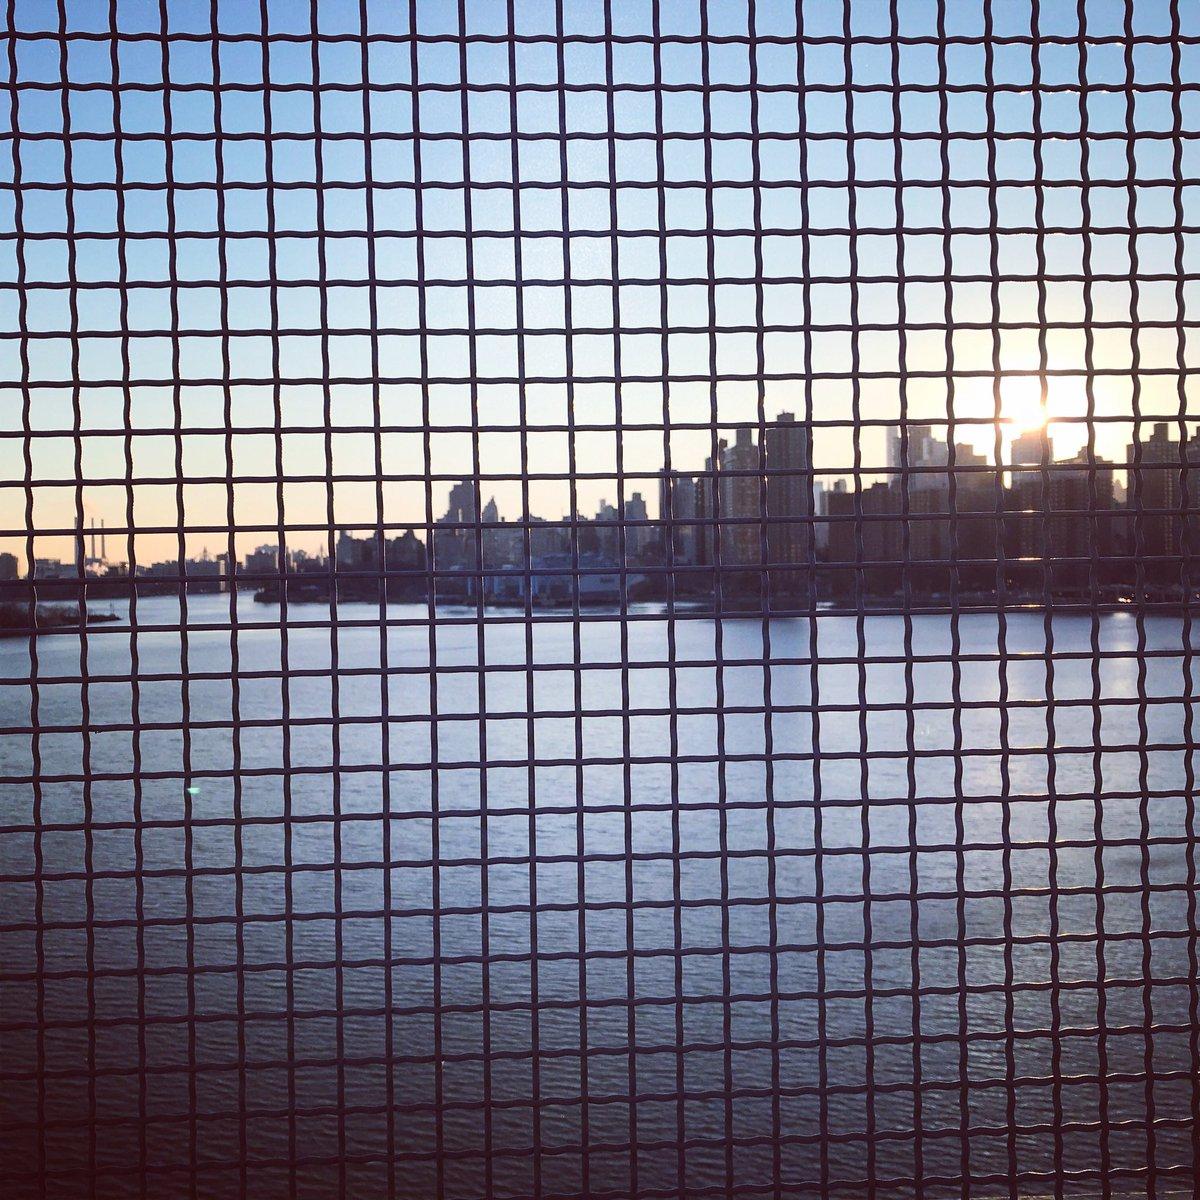 squares of #nyc https://t.co/5qe90veVwb